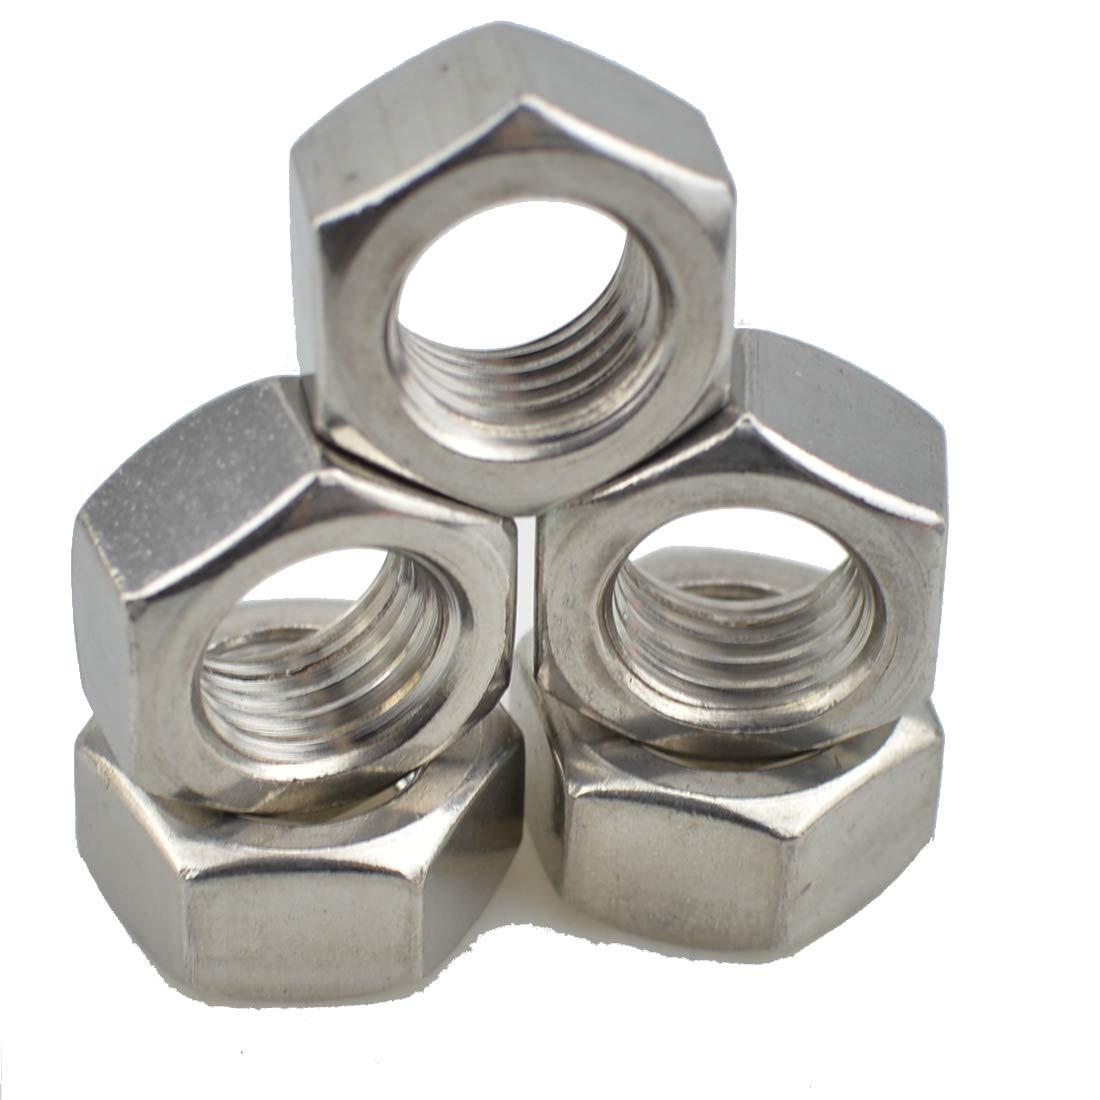 5, M16-2.0 pitch XunLiu 316 Stainless Steel Hex Nut